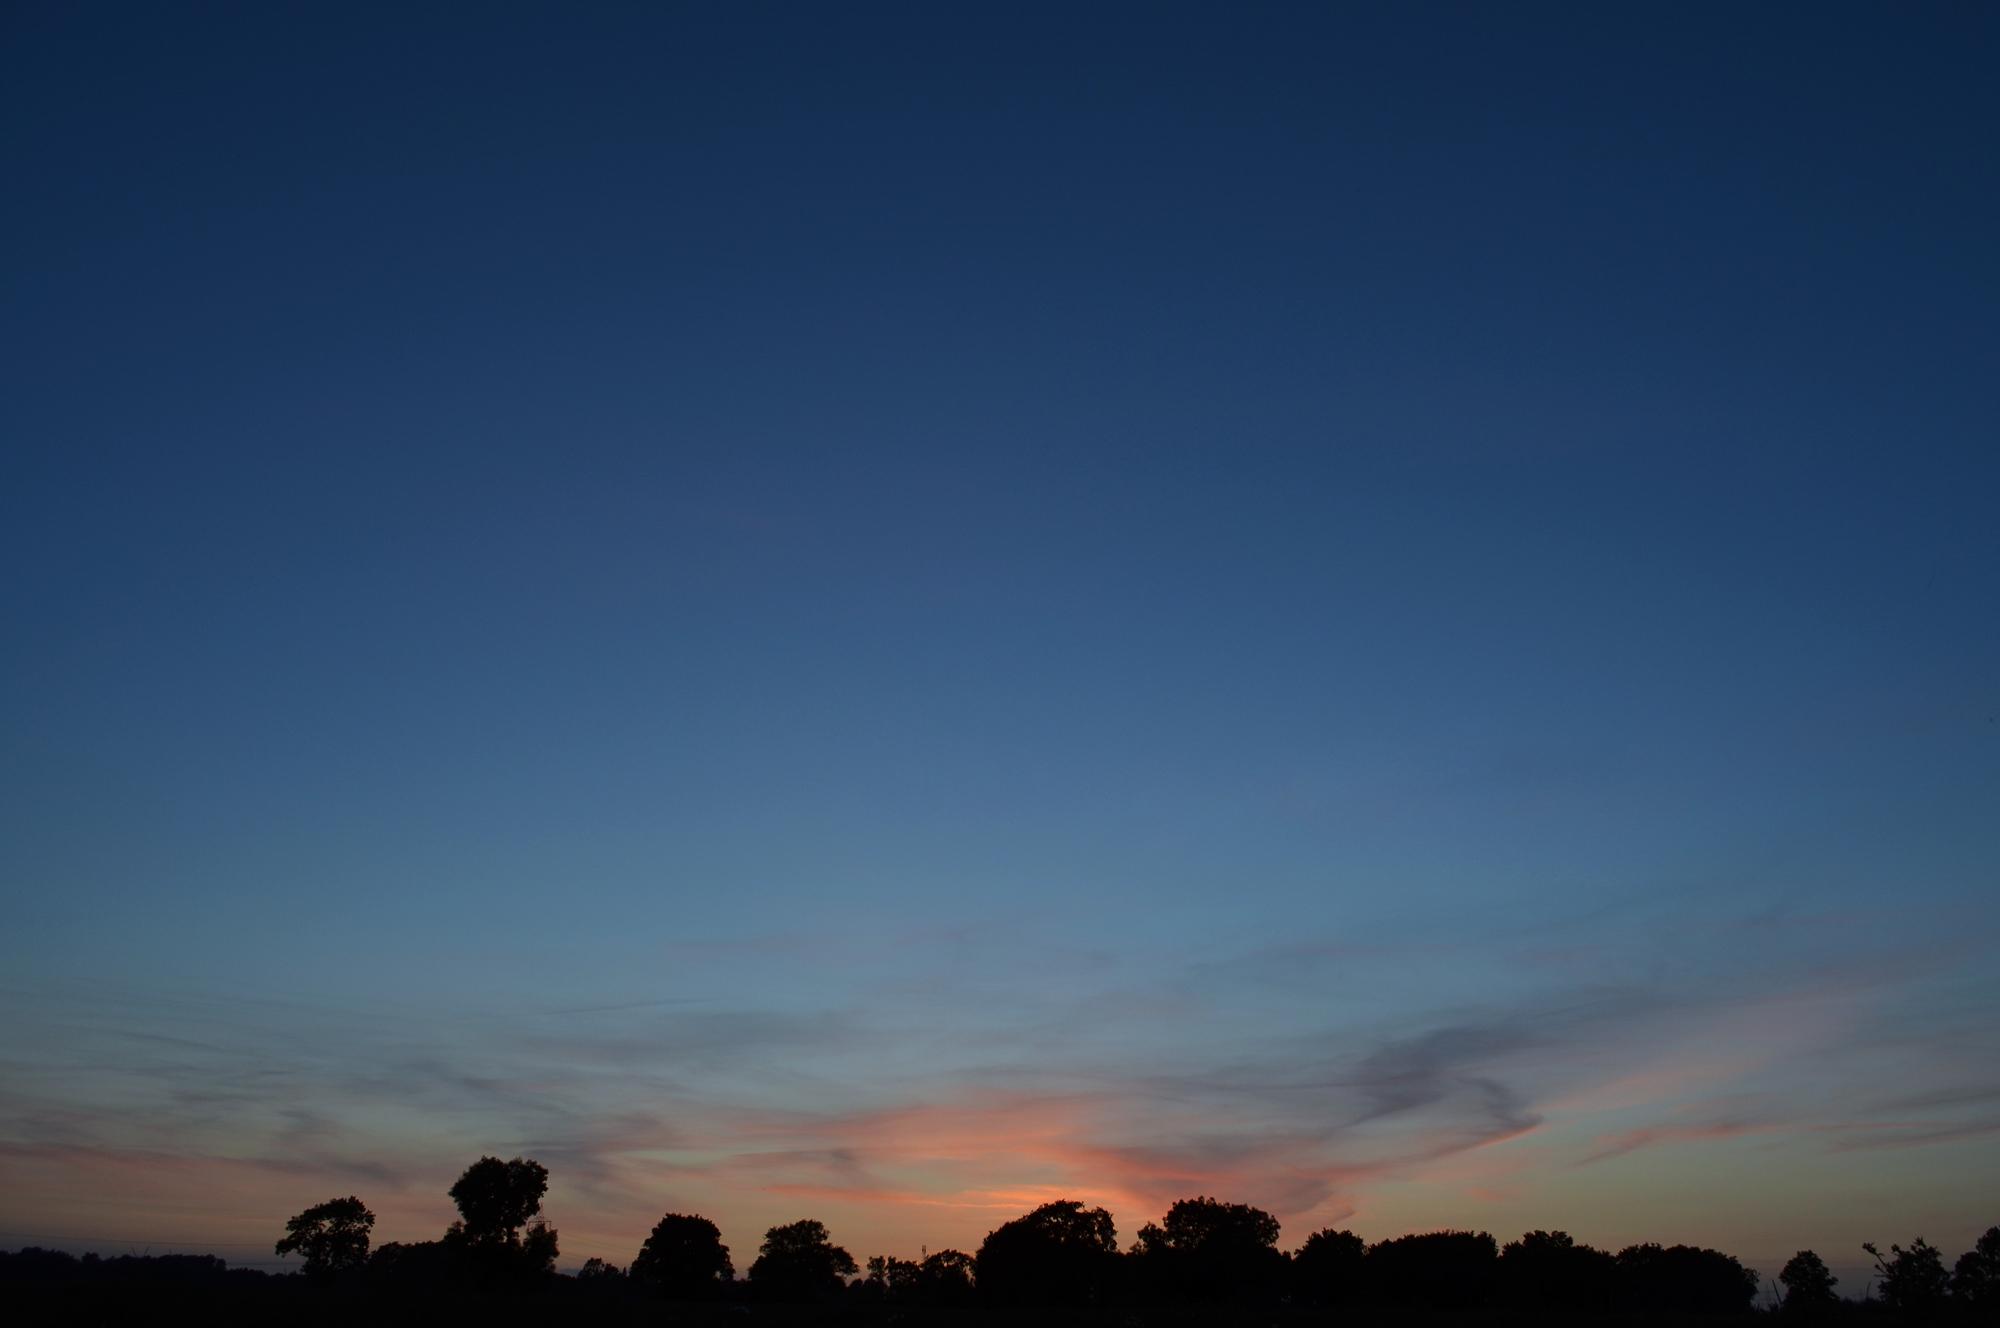 Foto: Das Blaue vom Sonnenuntergang